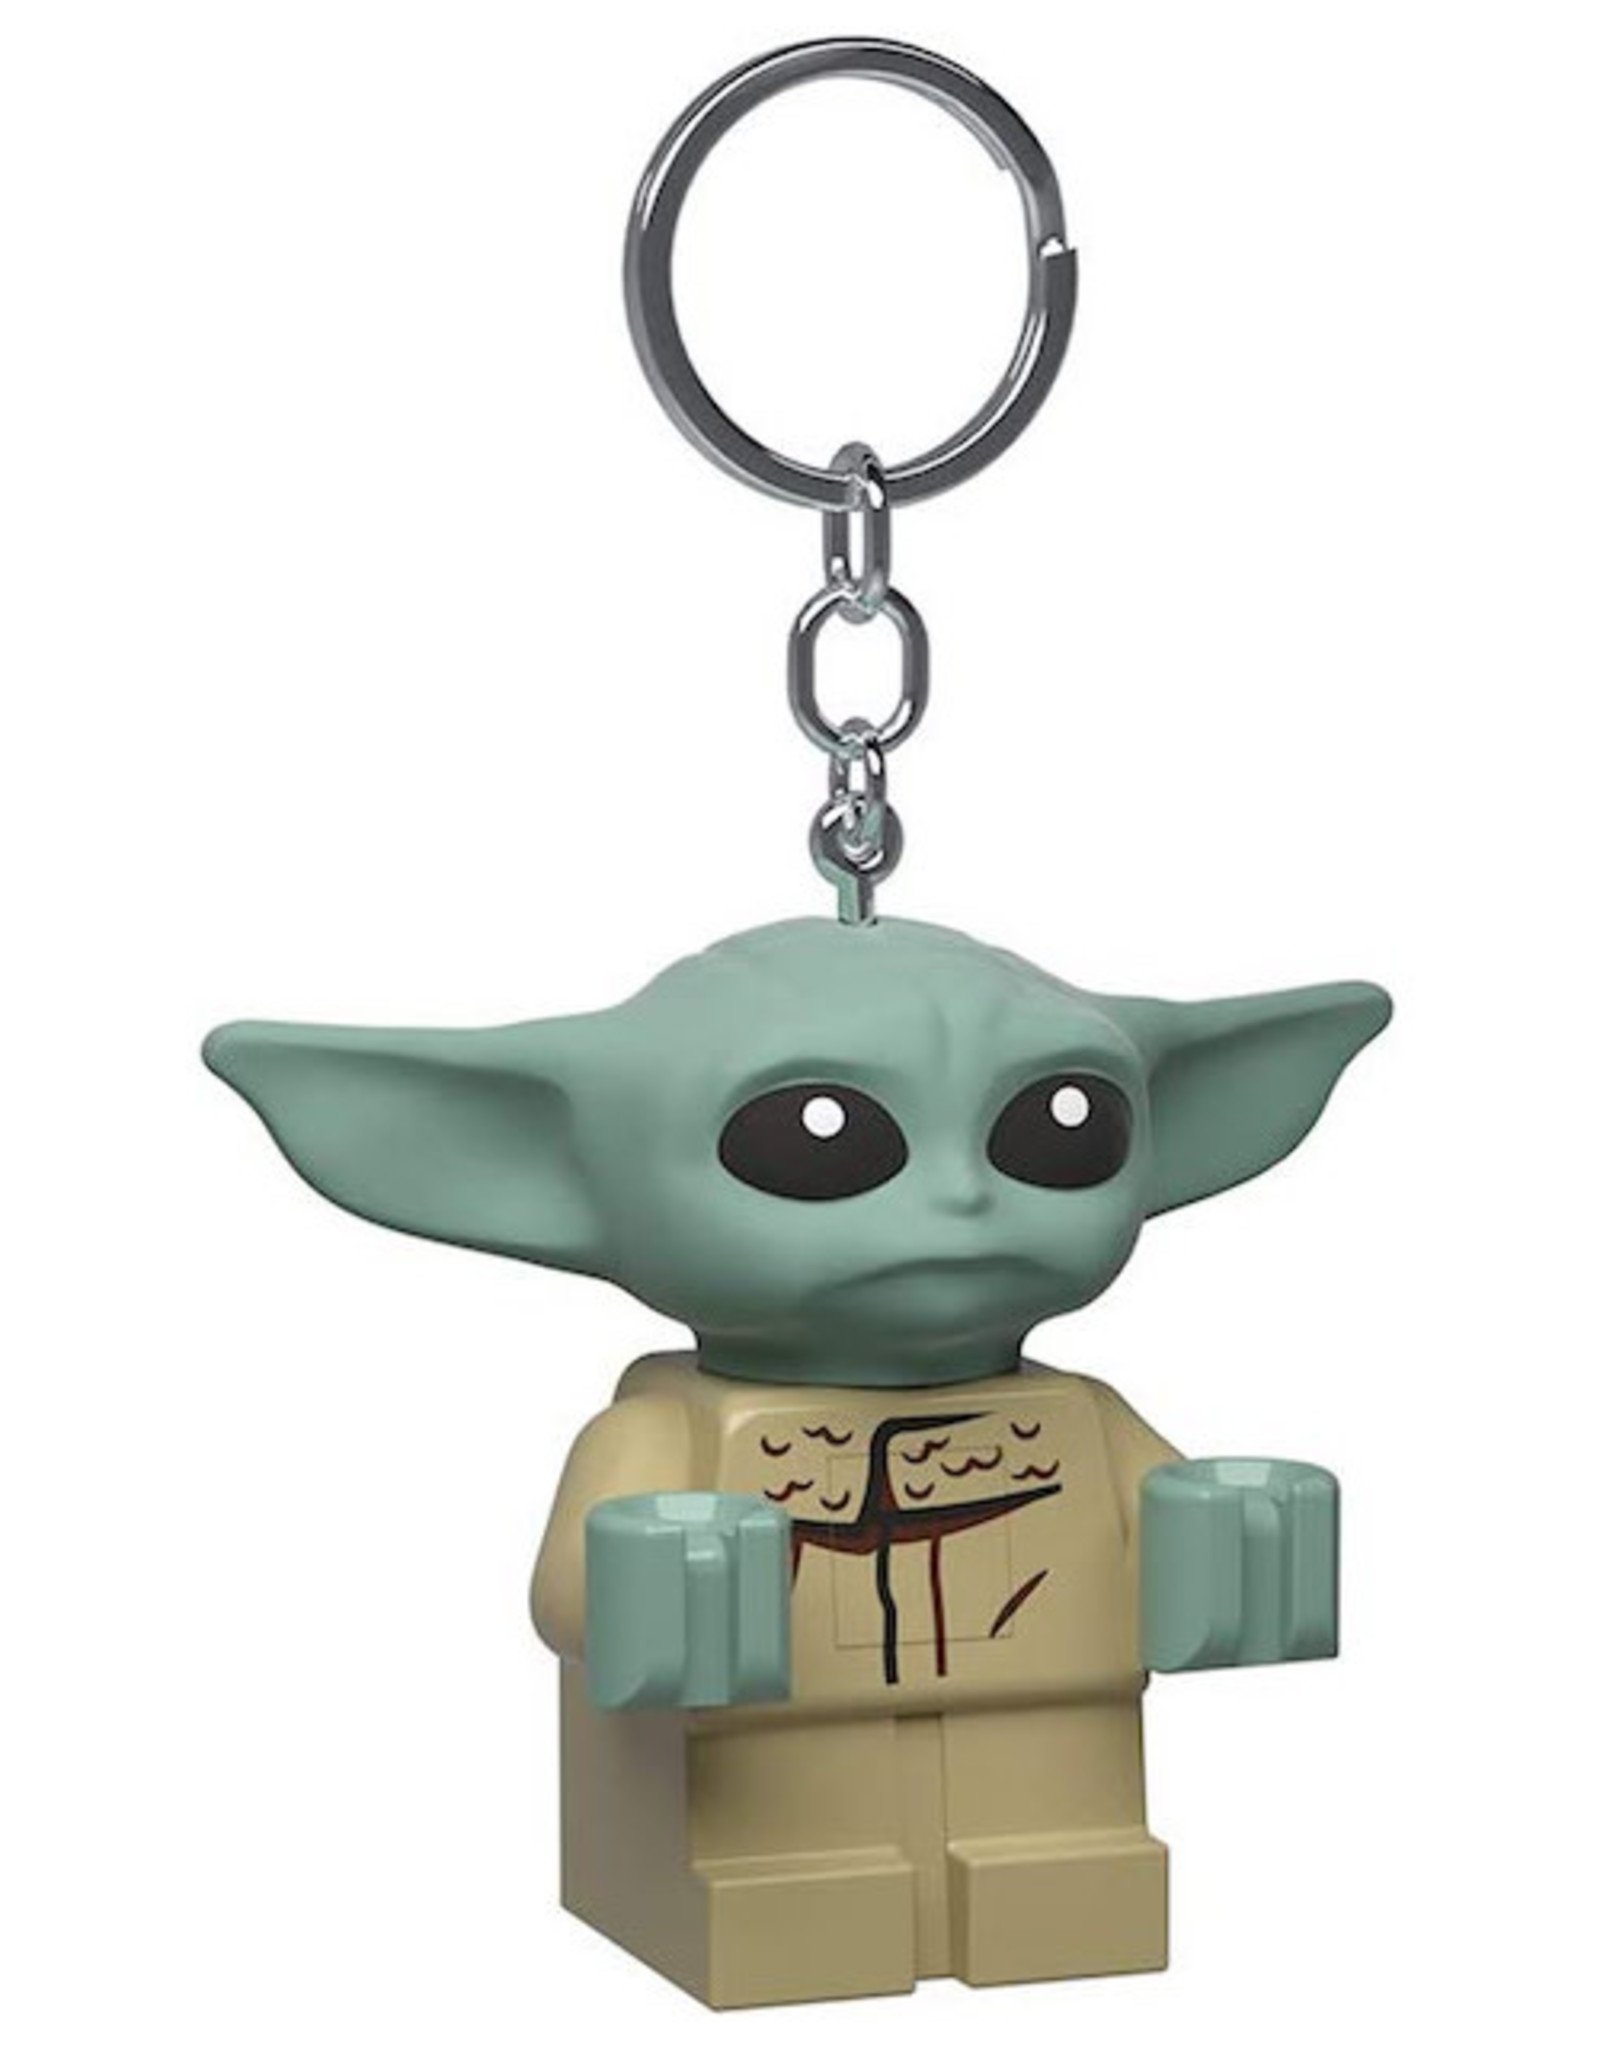 Lego Star Wars Keychain Light